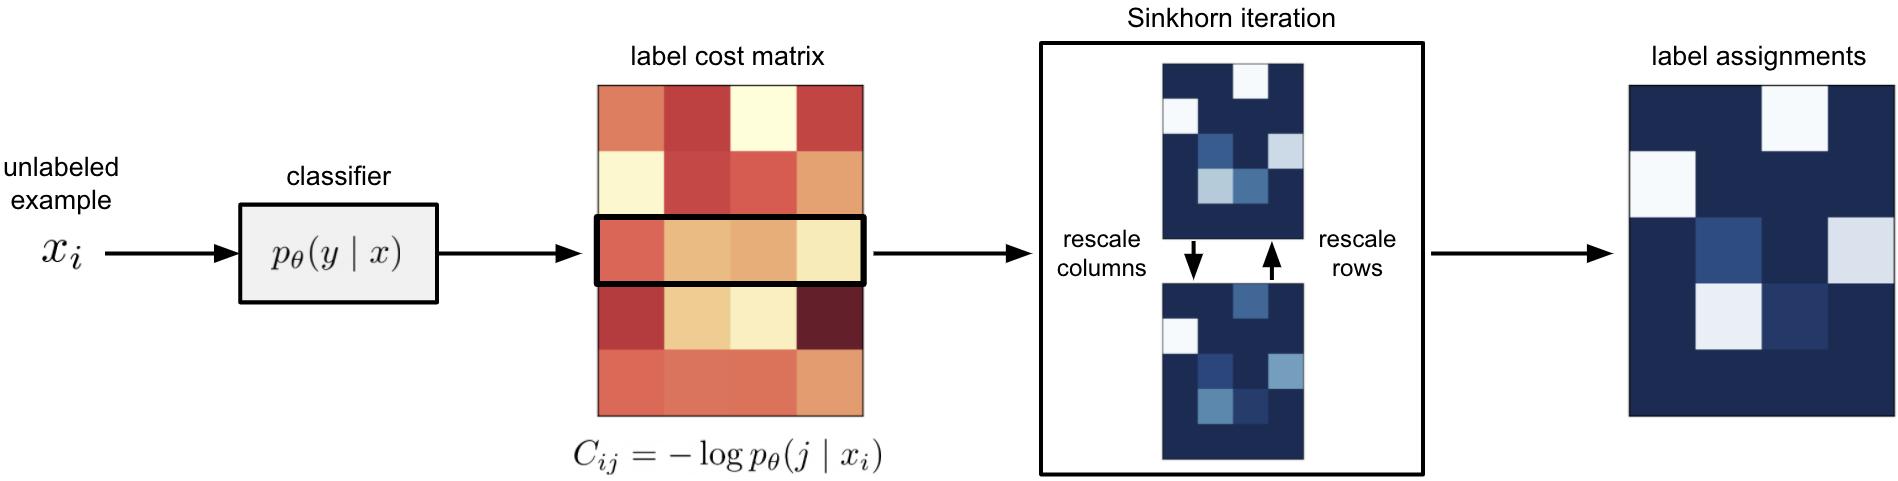 Schematic illustration of Sinkhorn Label Allocation